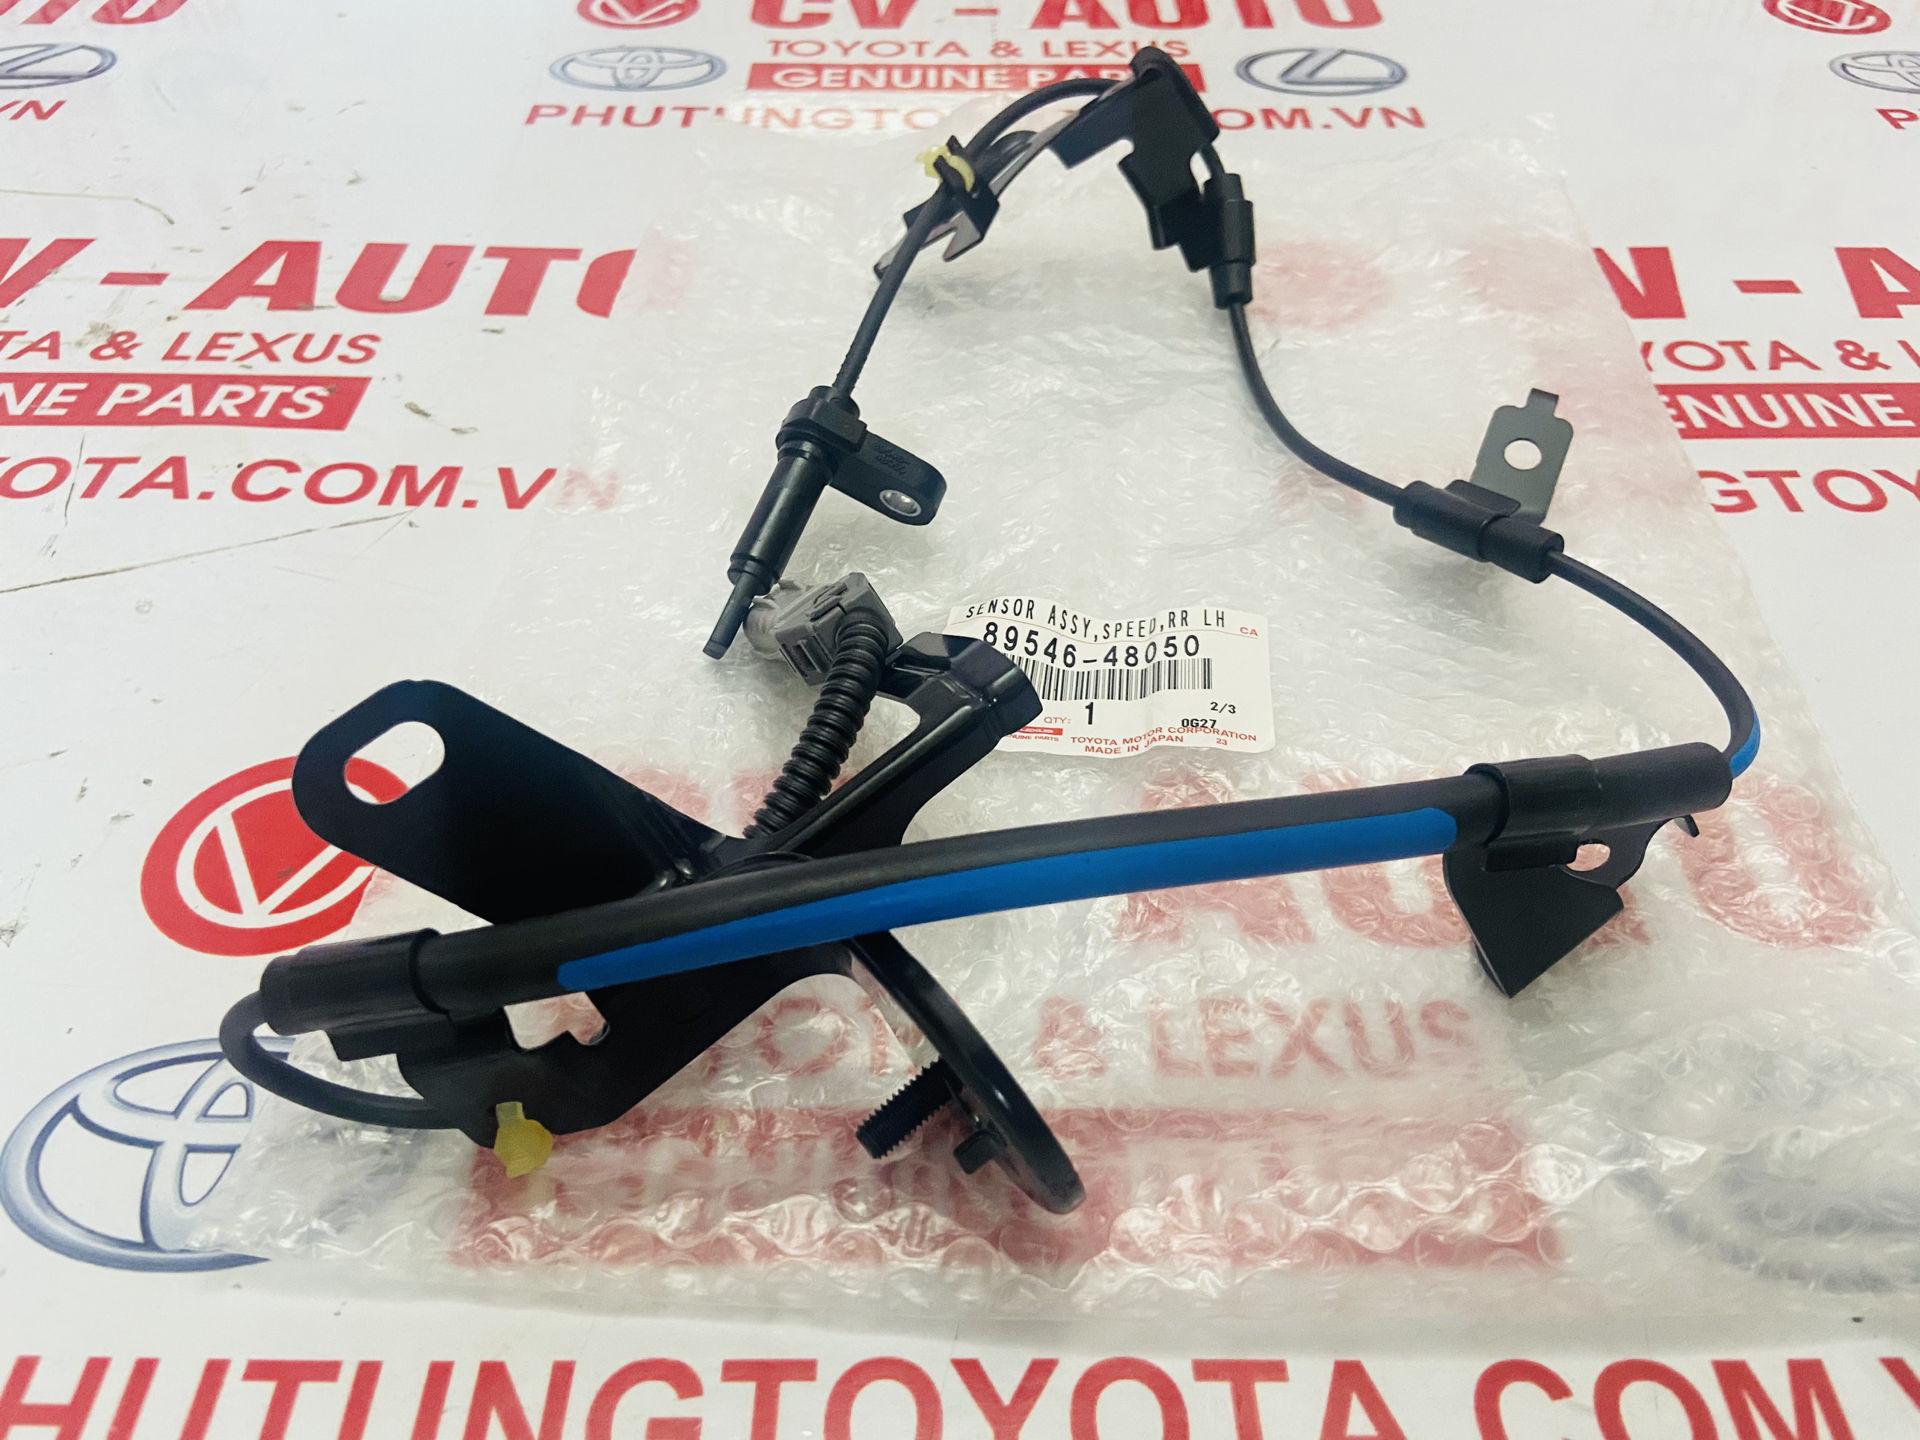 Picture of 89545-48050, 89546-48050 Cảm biến ABS sau Lexus RX350, RX450H chính hãng